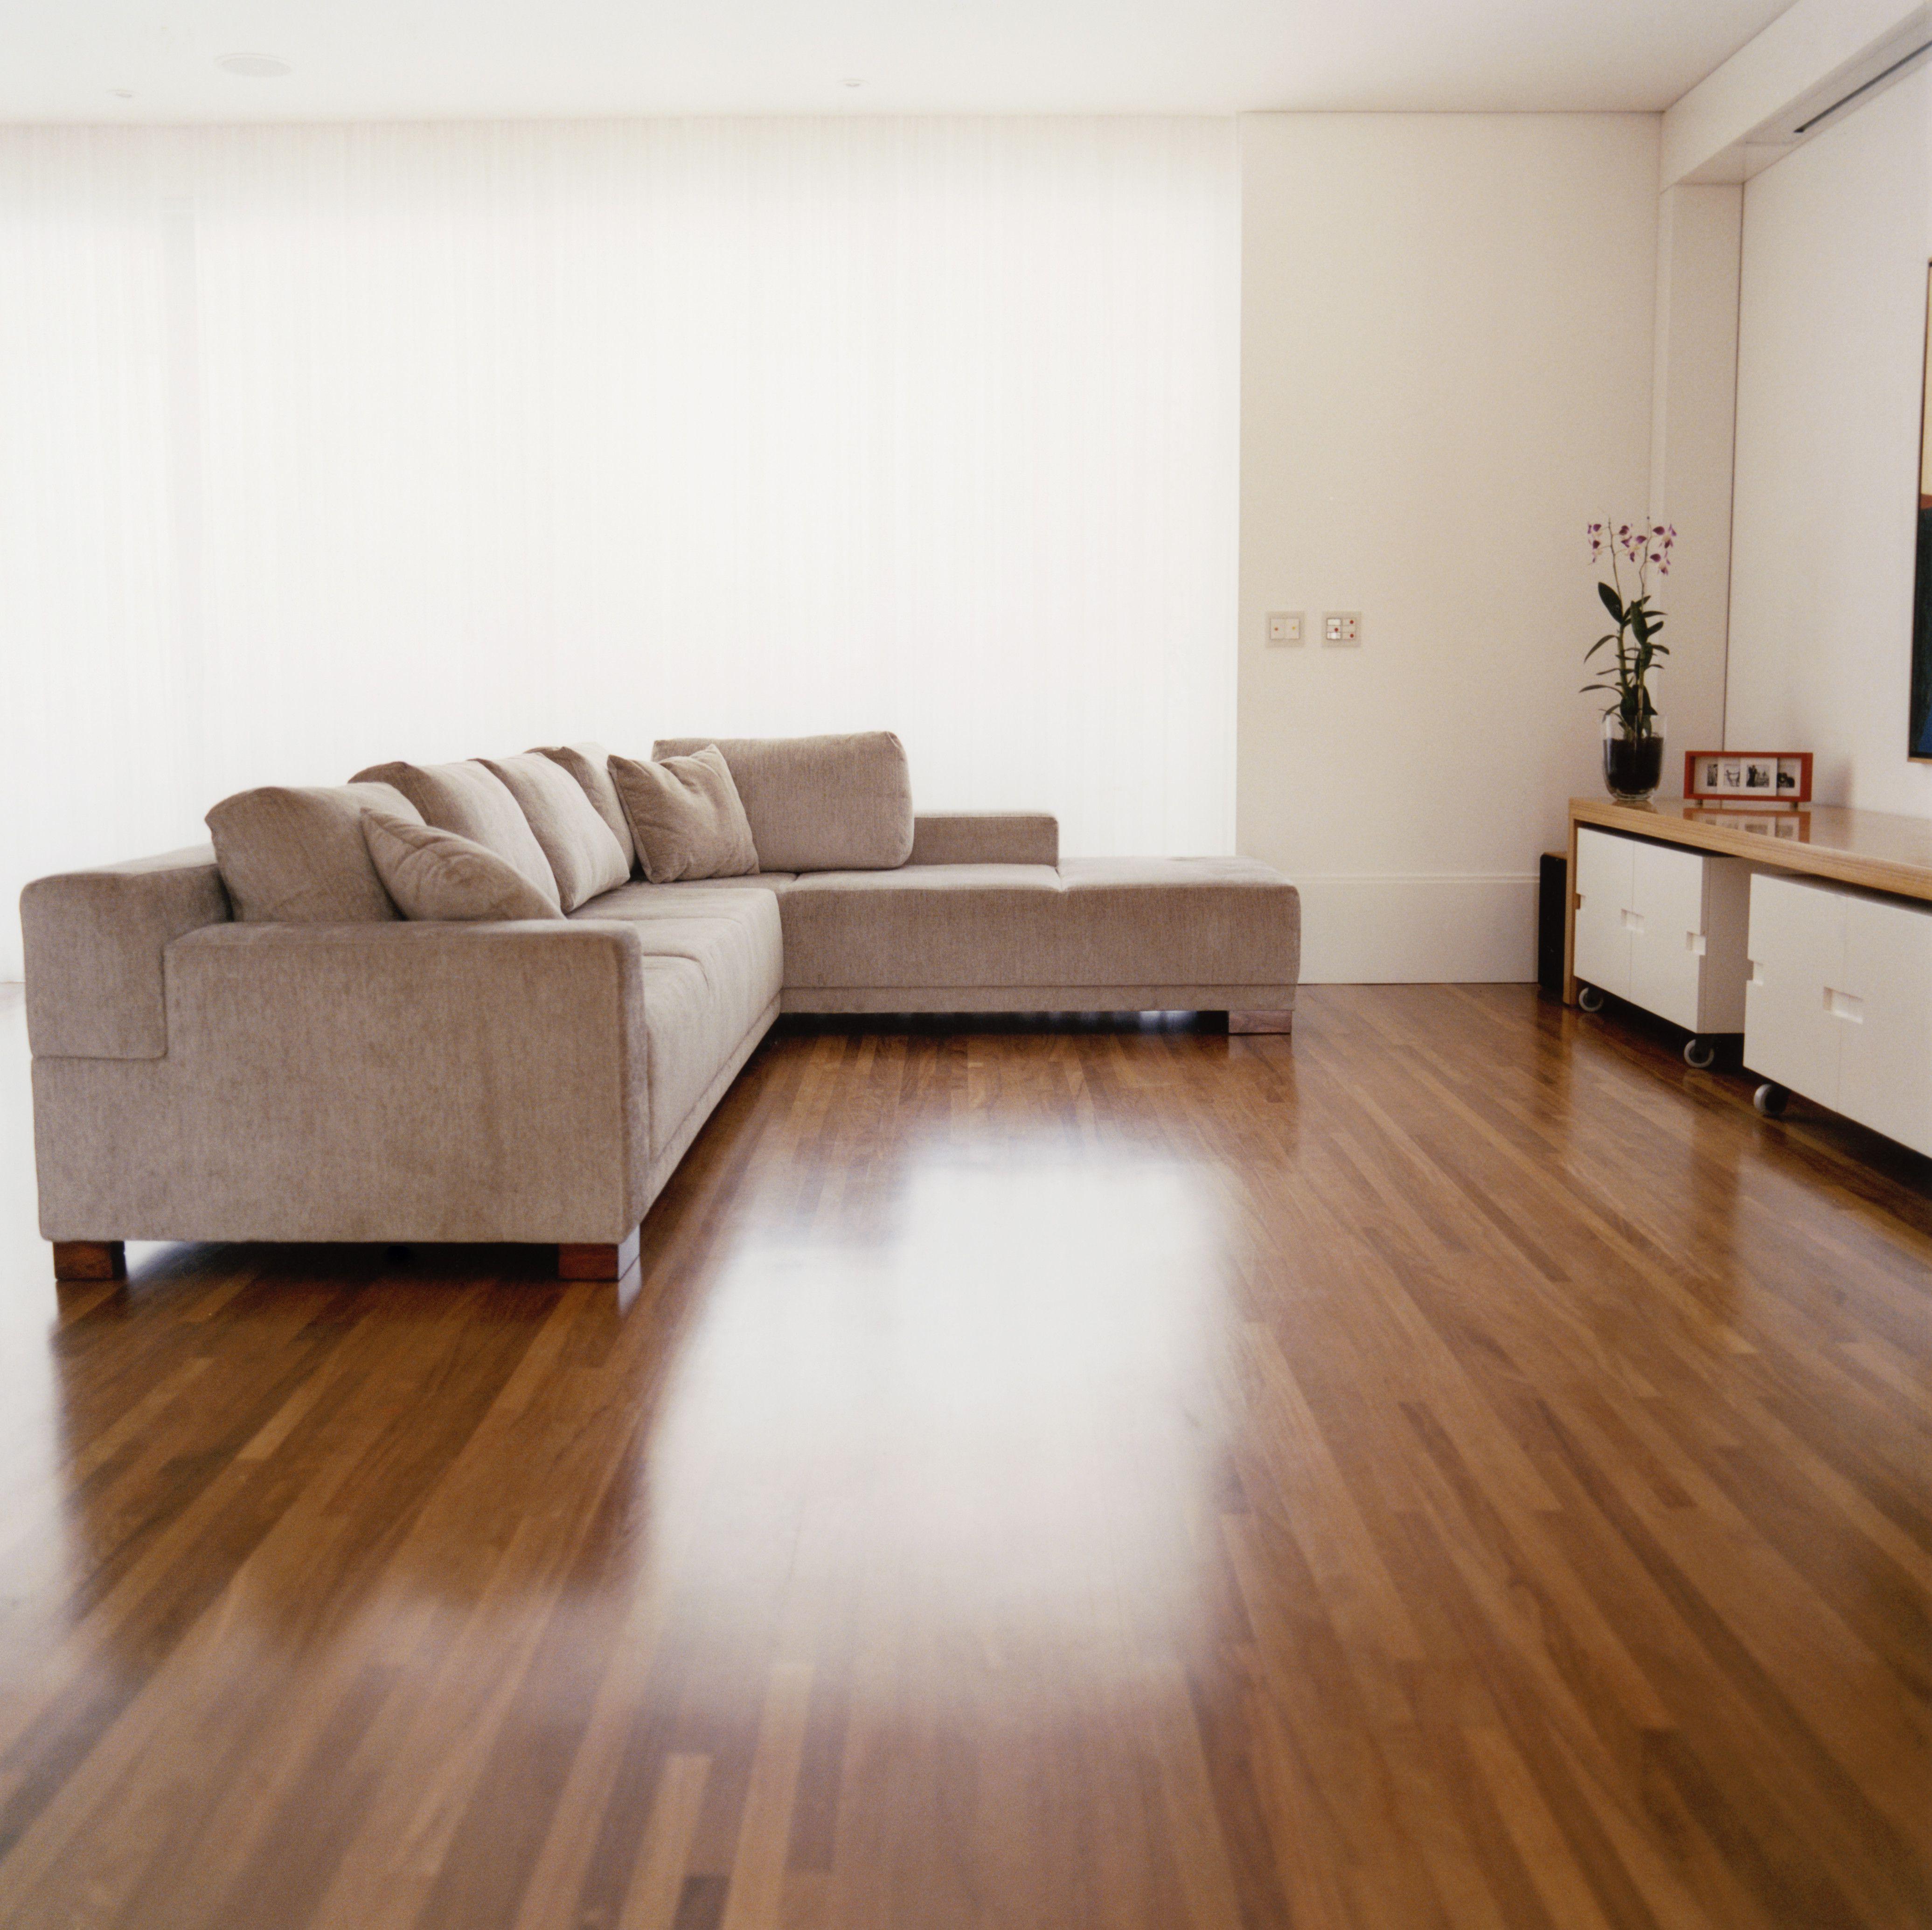 ideas covering design creative fancy garage blue on flooring coatings pertaining floor options resin coastal of epoxy kit cheap